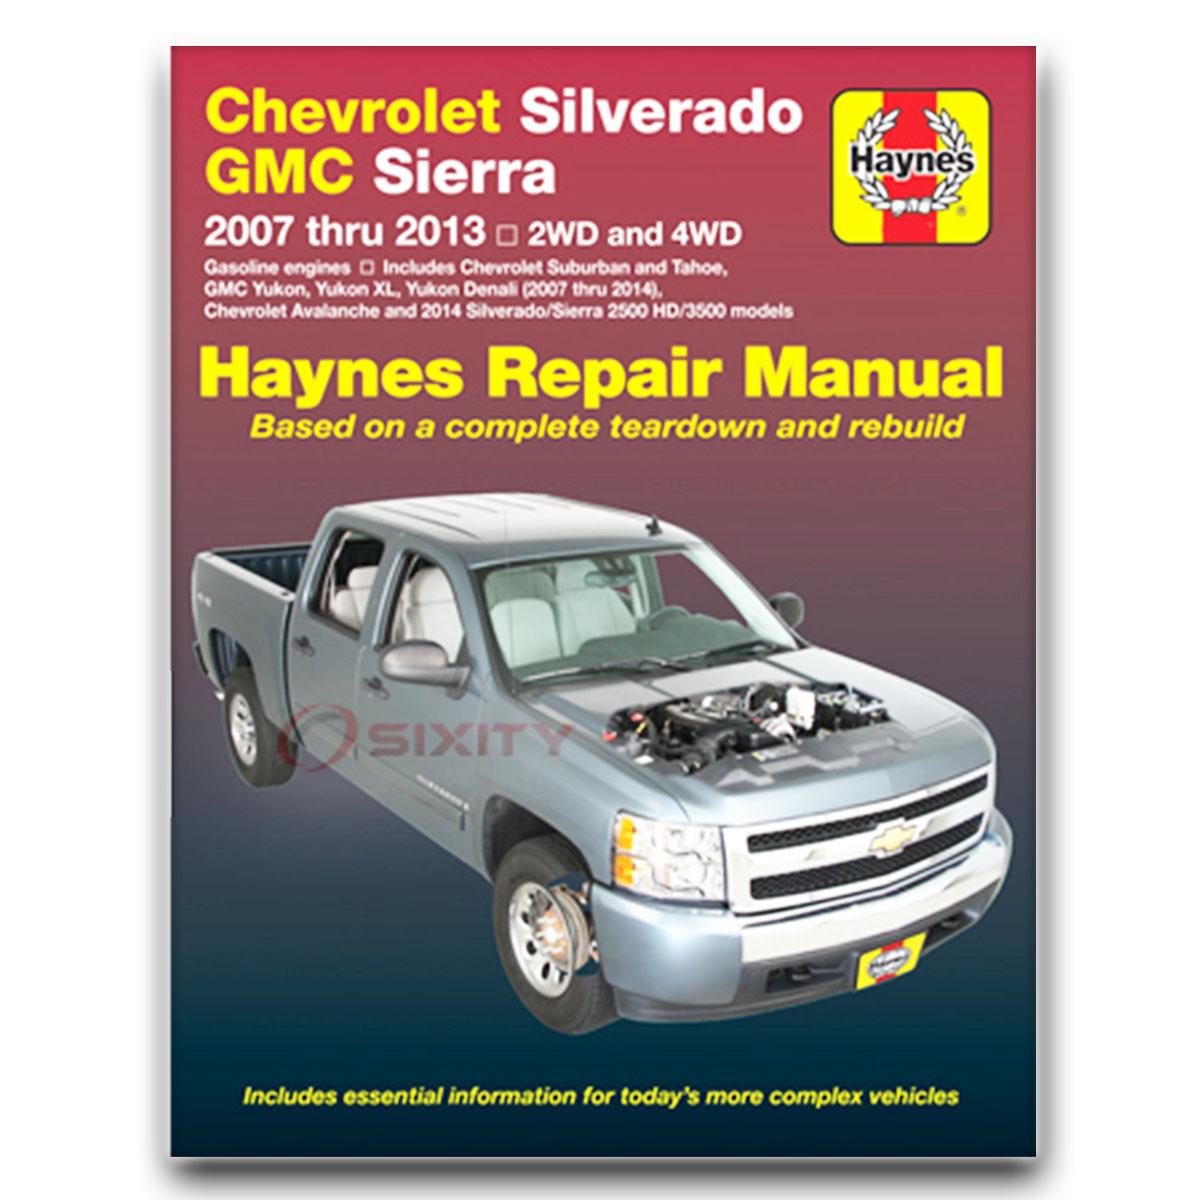 chevy silverado 1500 haynes repair manual hybrid lt wt ltz classic rh ebay com 2014 gmc sierra manual pdf 2014 gmc sierra manual pdf